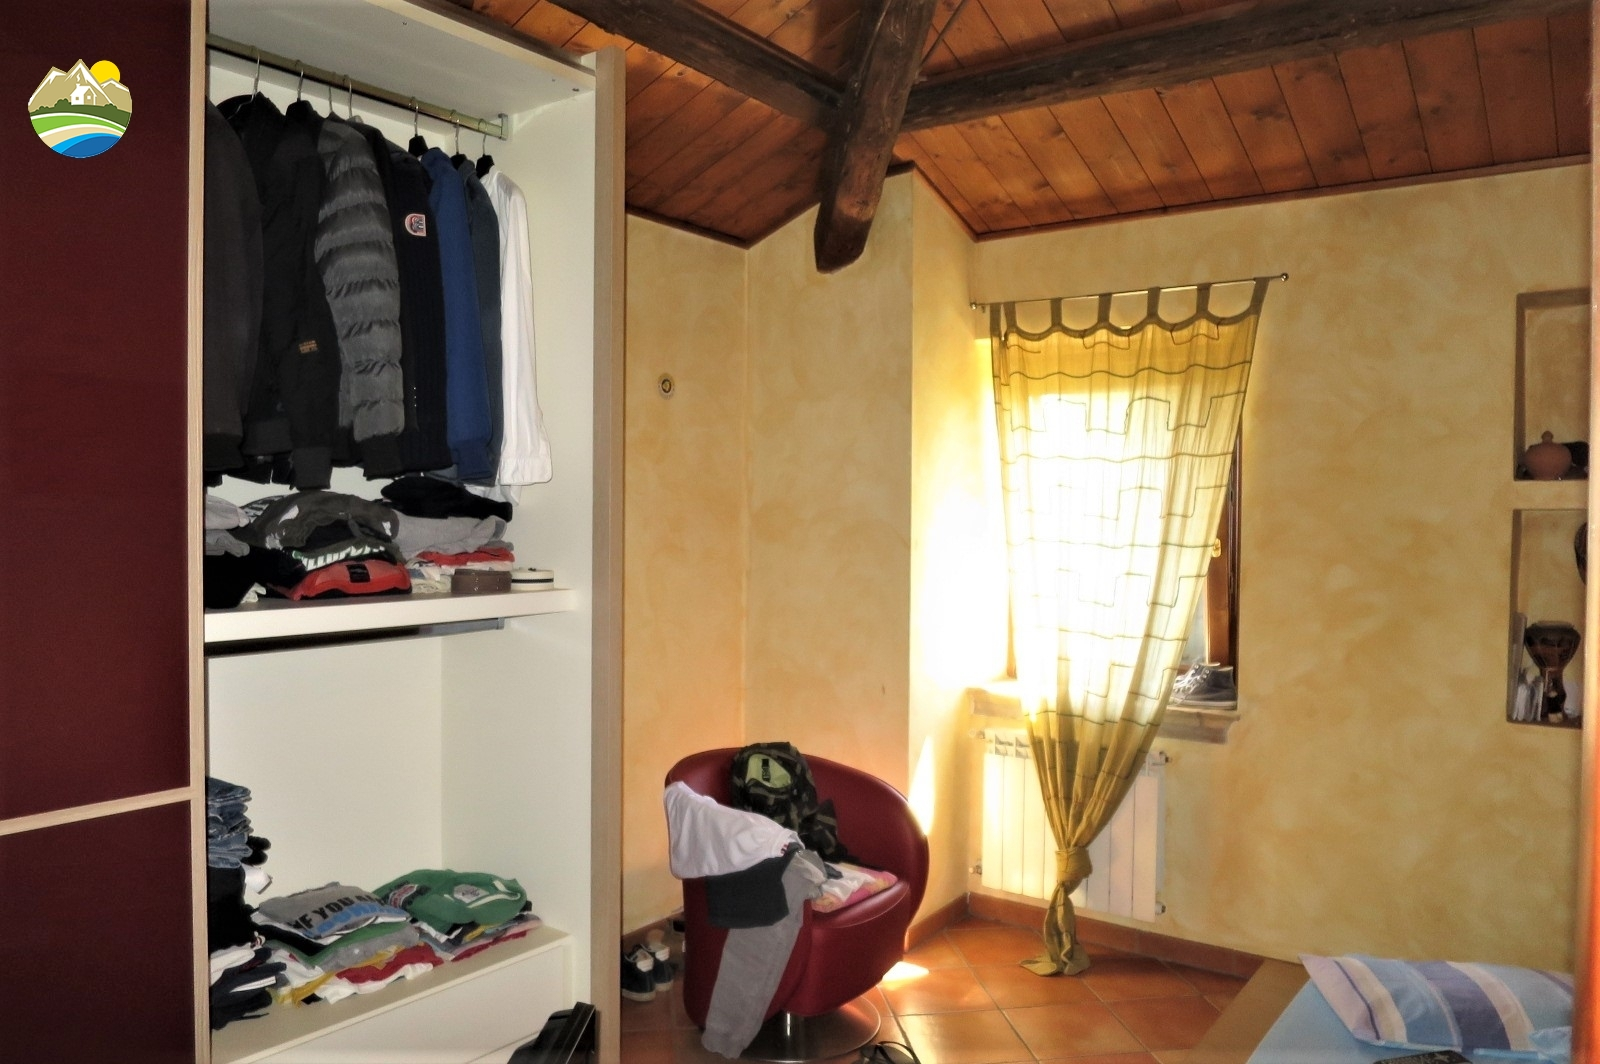 Country Houses Country Houses for sale Morro D'Oro (TE), Casa del Moro - Morro D'Oro - EUR 327.141 570